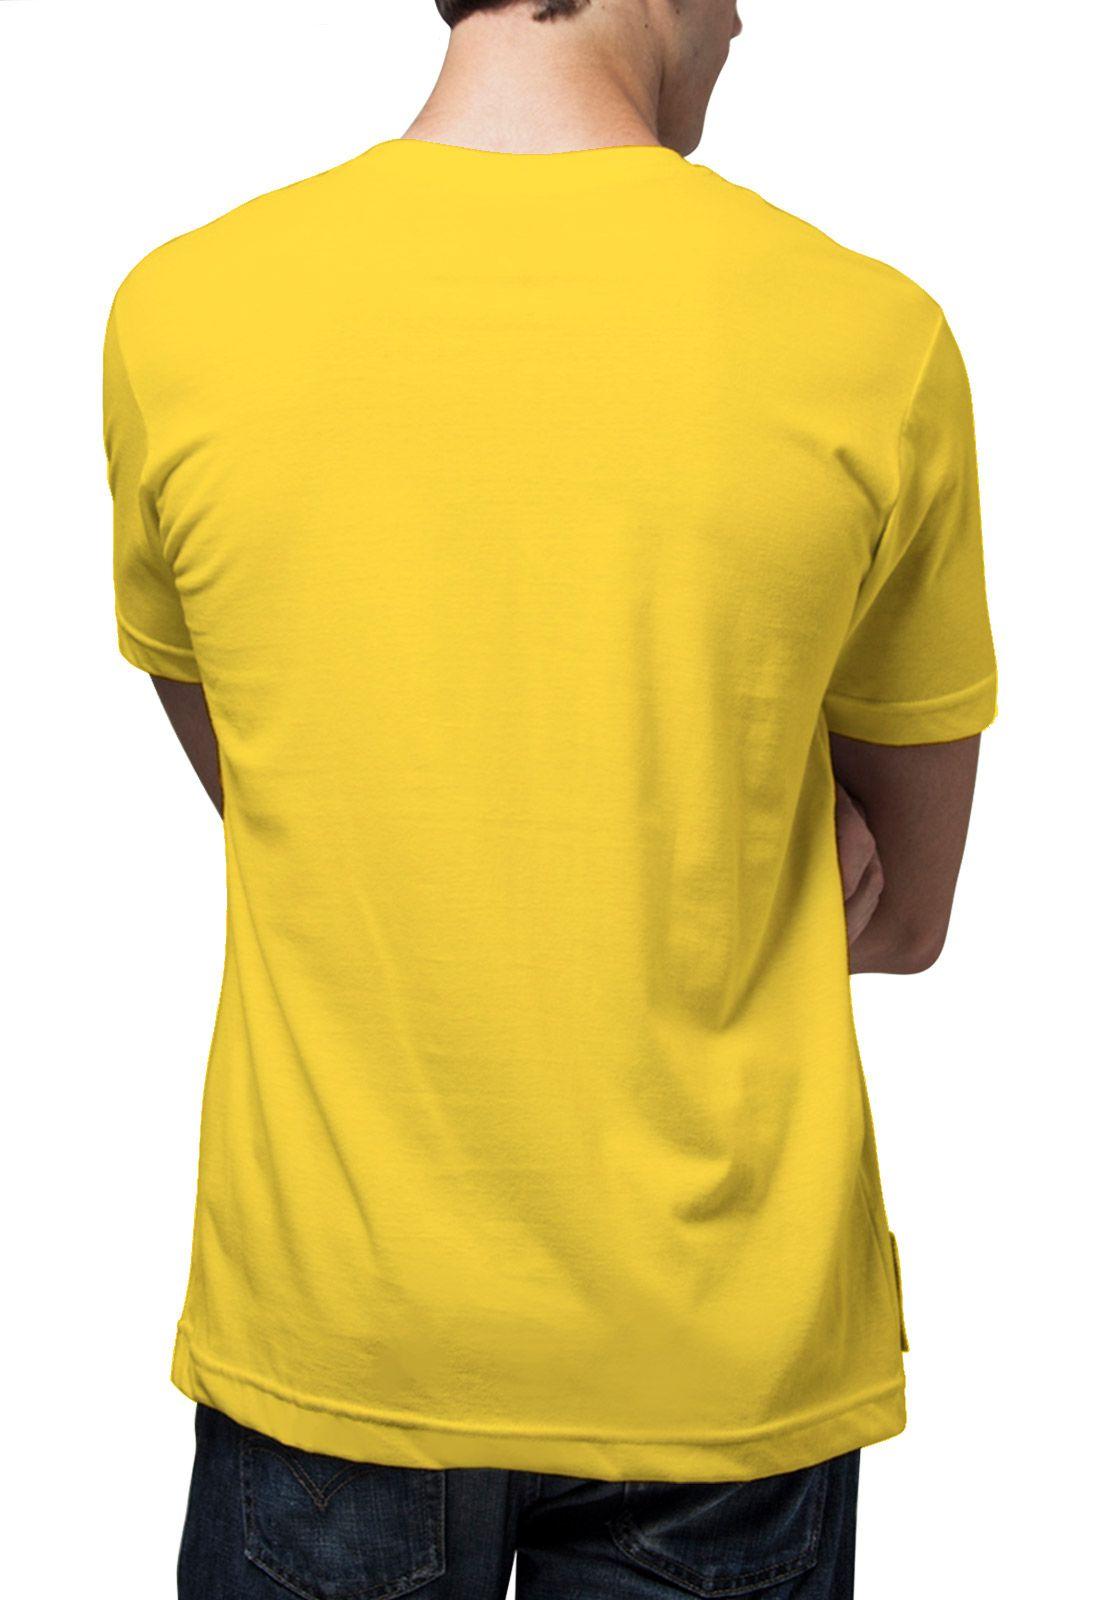 Camiseta Amazônia Bob e Peter - Amarelo Escuro